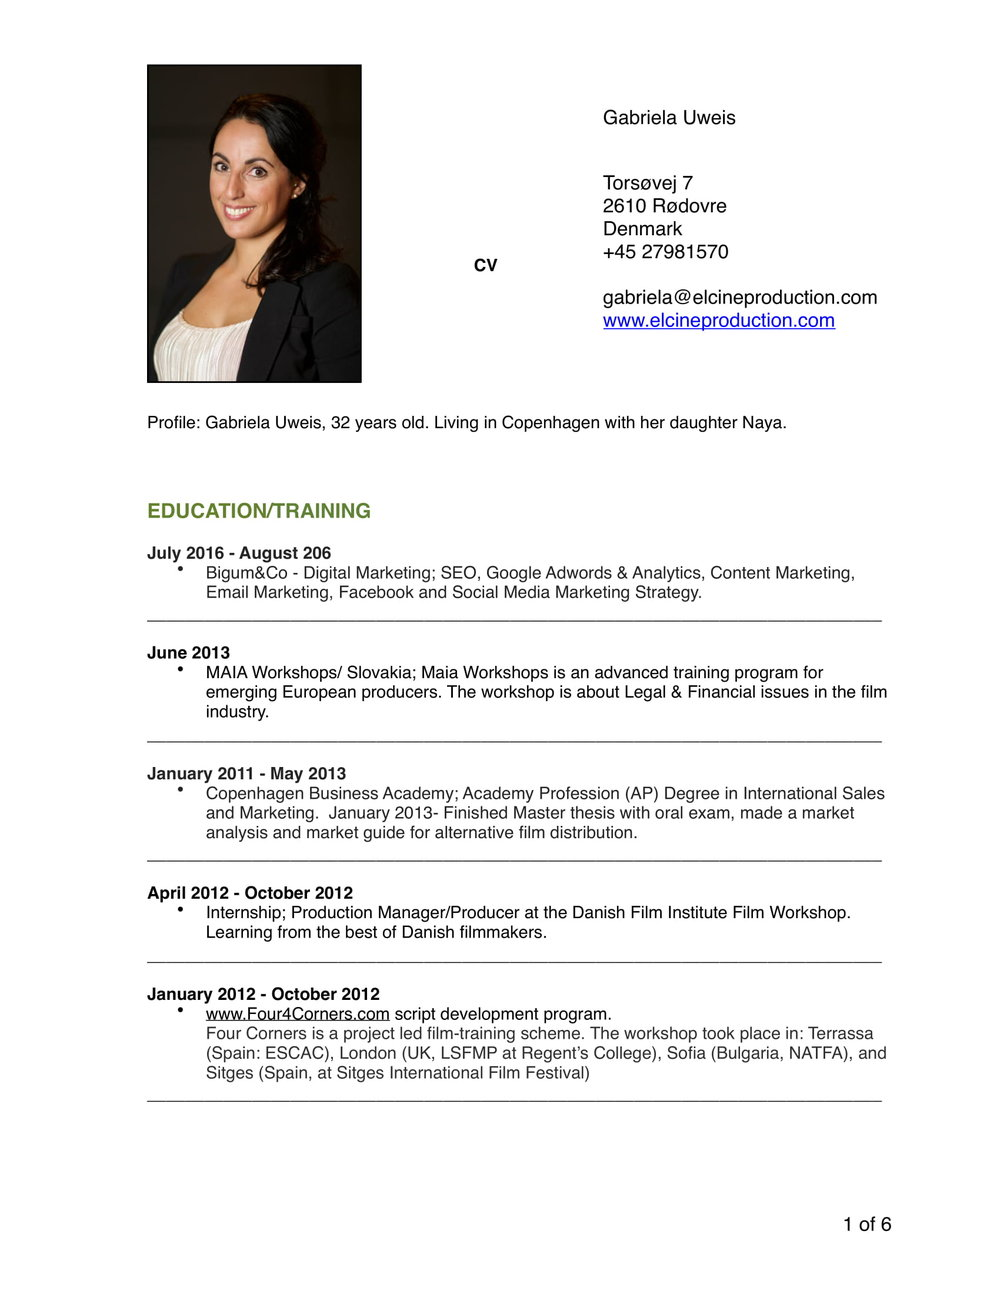 Resume — EL CINE PRODUCTION - Film, Documentary, Music Video ...